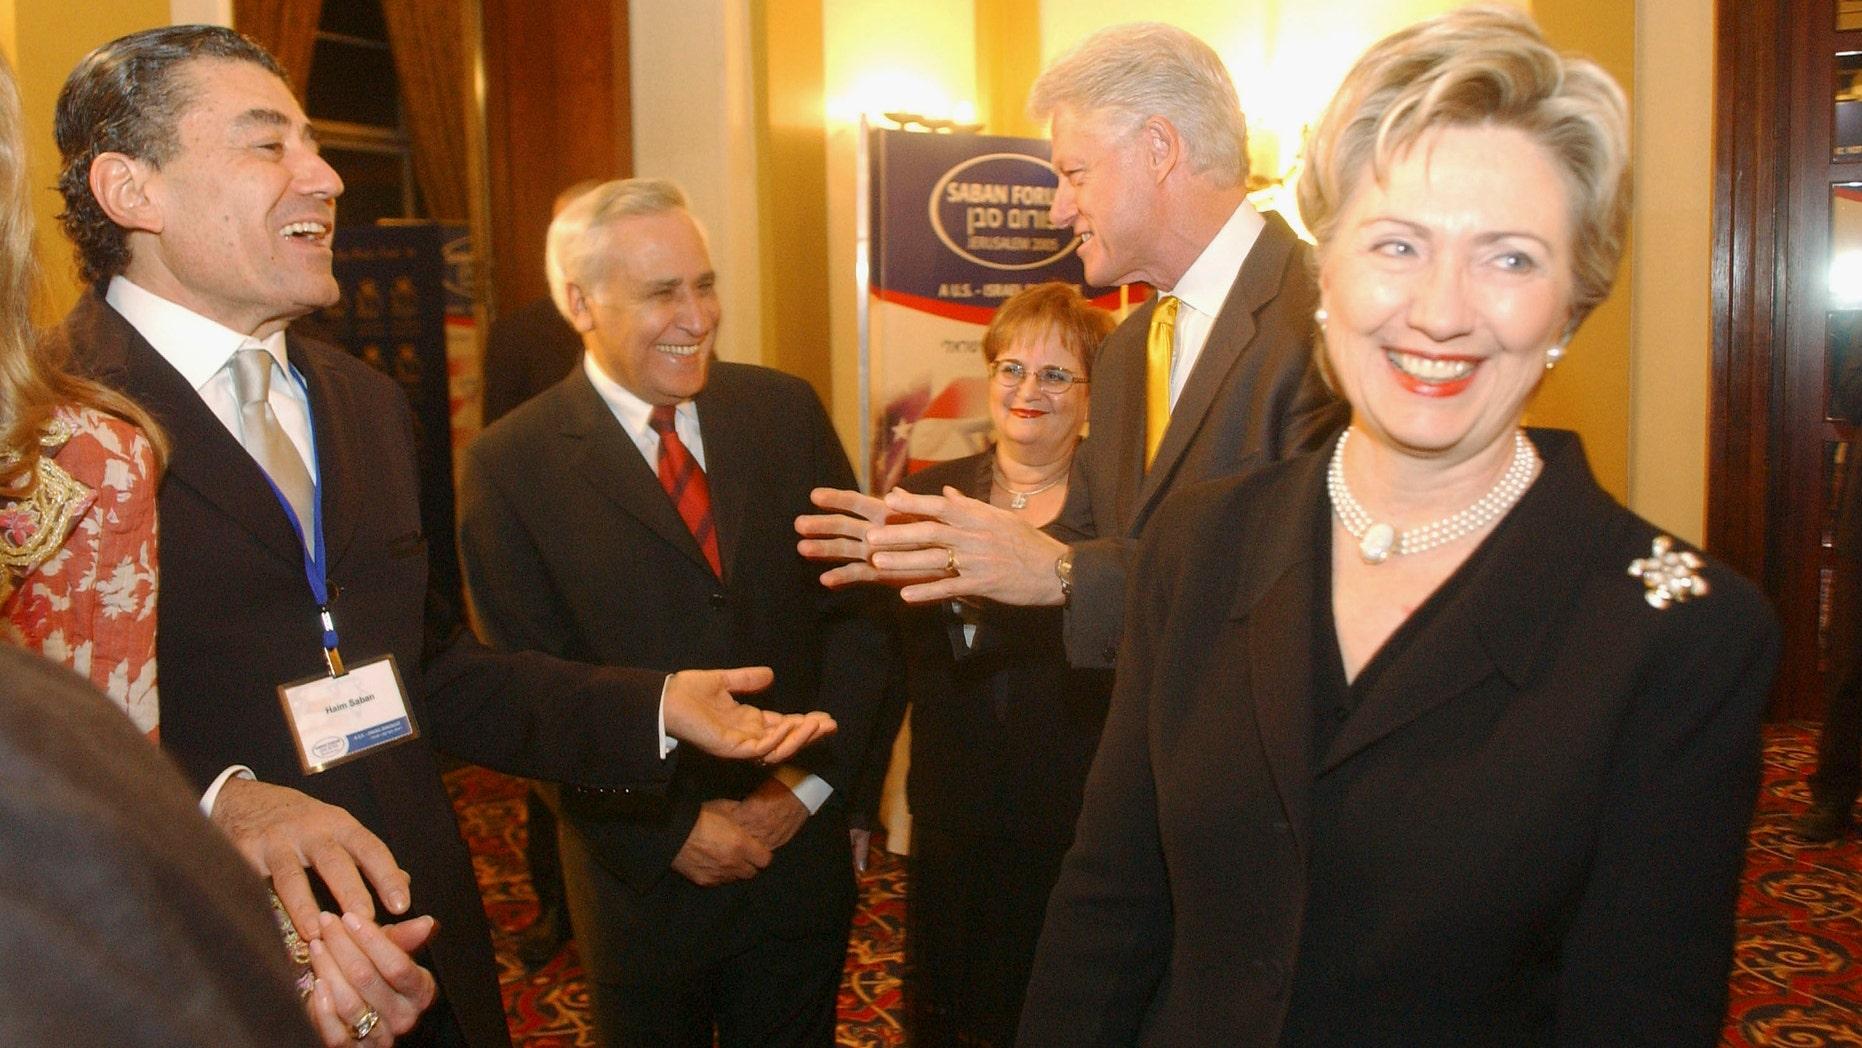 The U.S. Senator Hillary Clinton and former President Bill Clinton with Moshe Kazav and Haim Saban on Nov. 12, 2005 in Jerusalem, Israel.